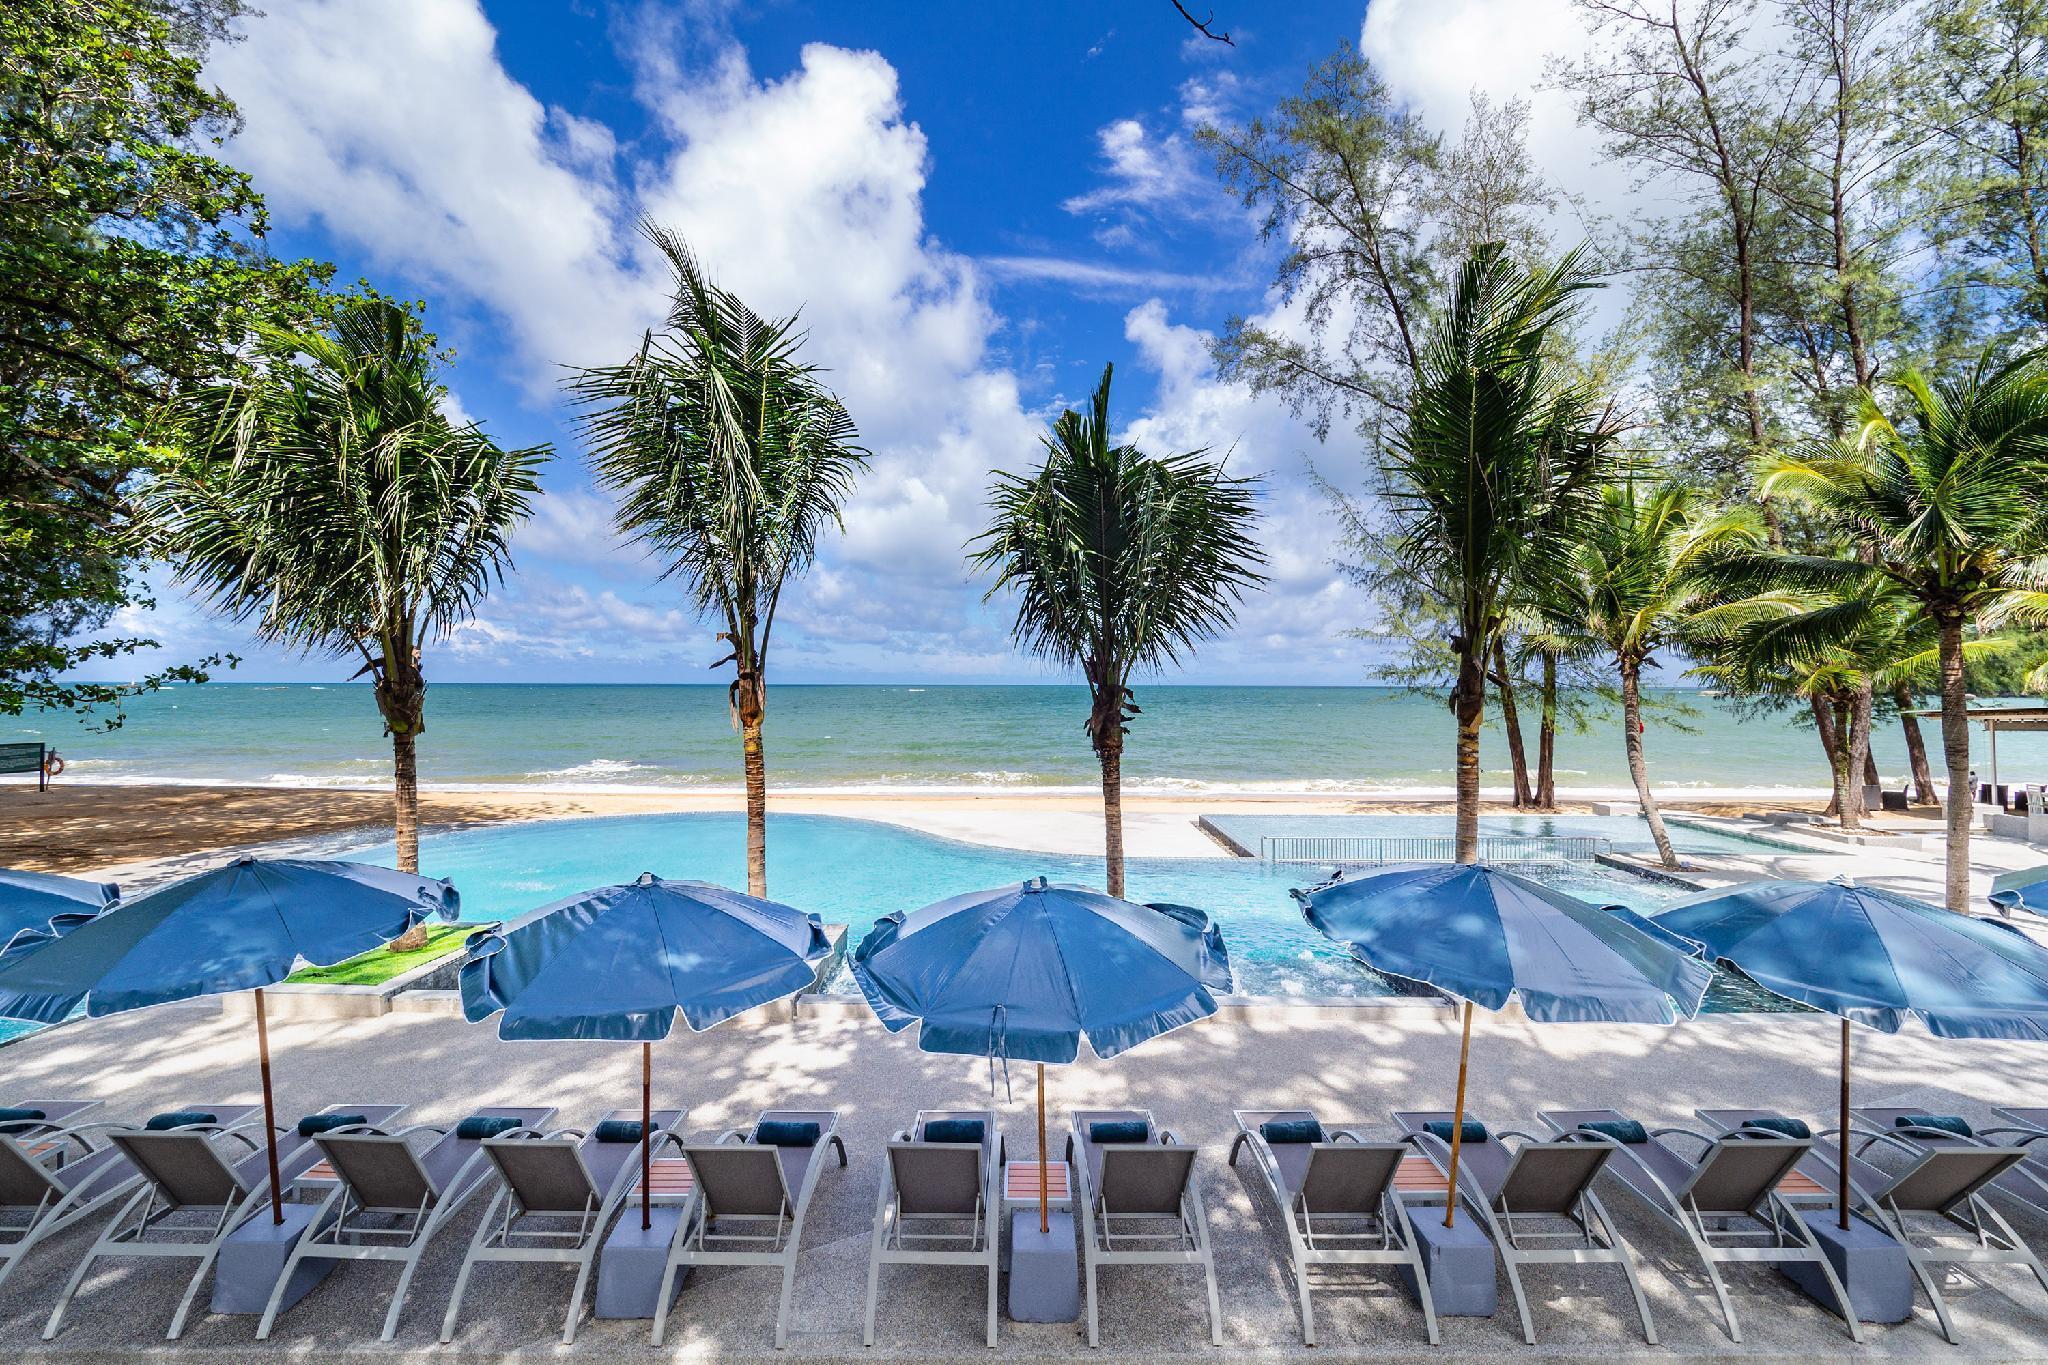 Khaolak Emerald Beach Resort & Spa เขาหลัก เอมเมอรัลด์ บีช รีสอร์ท แอนด์ สปา